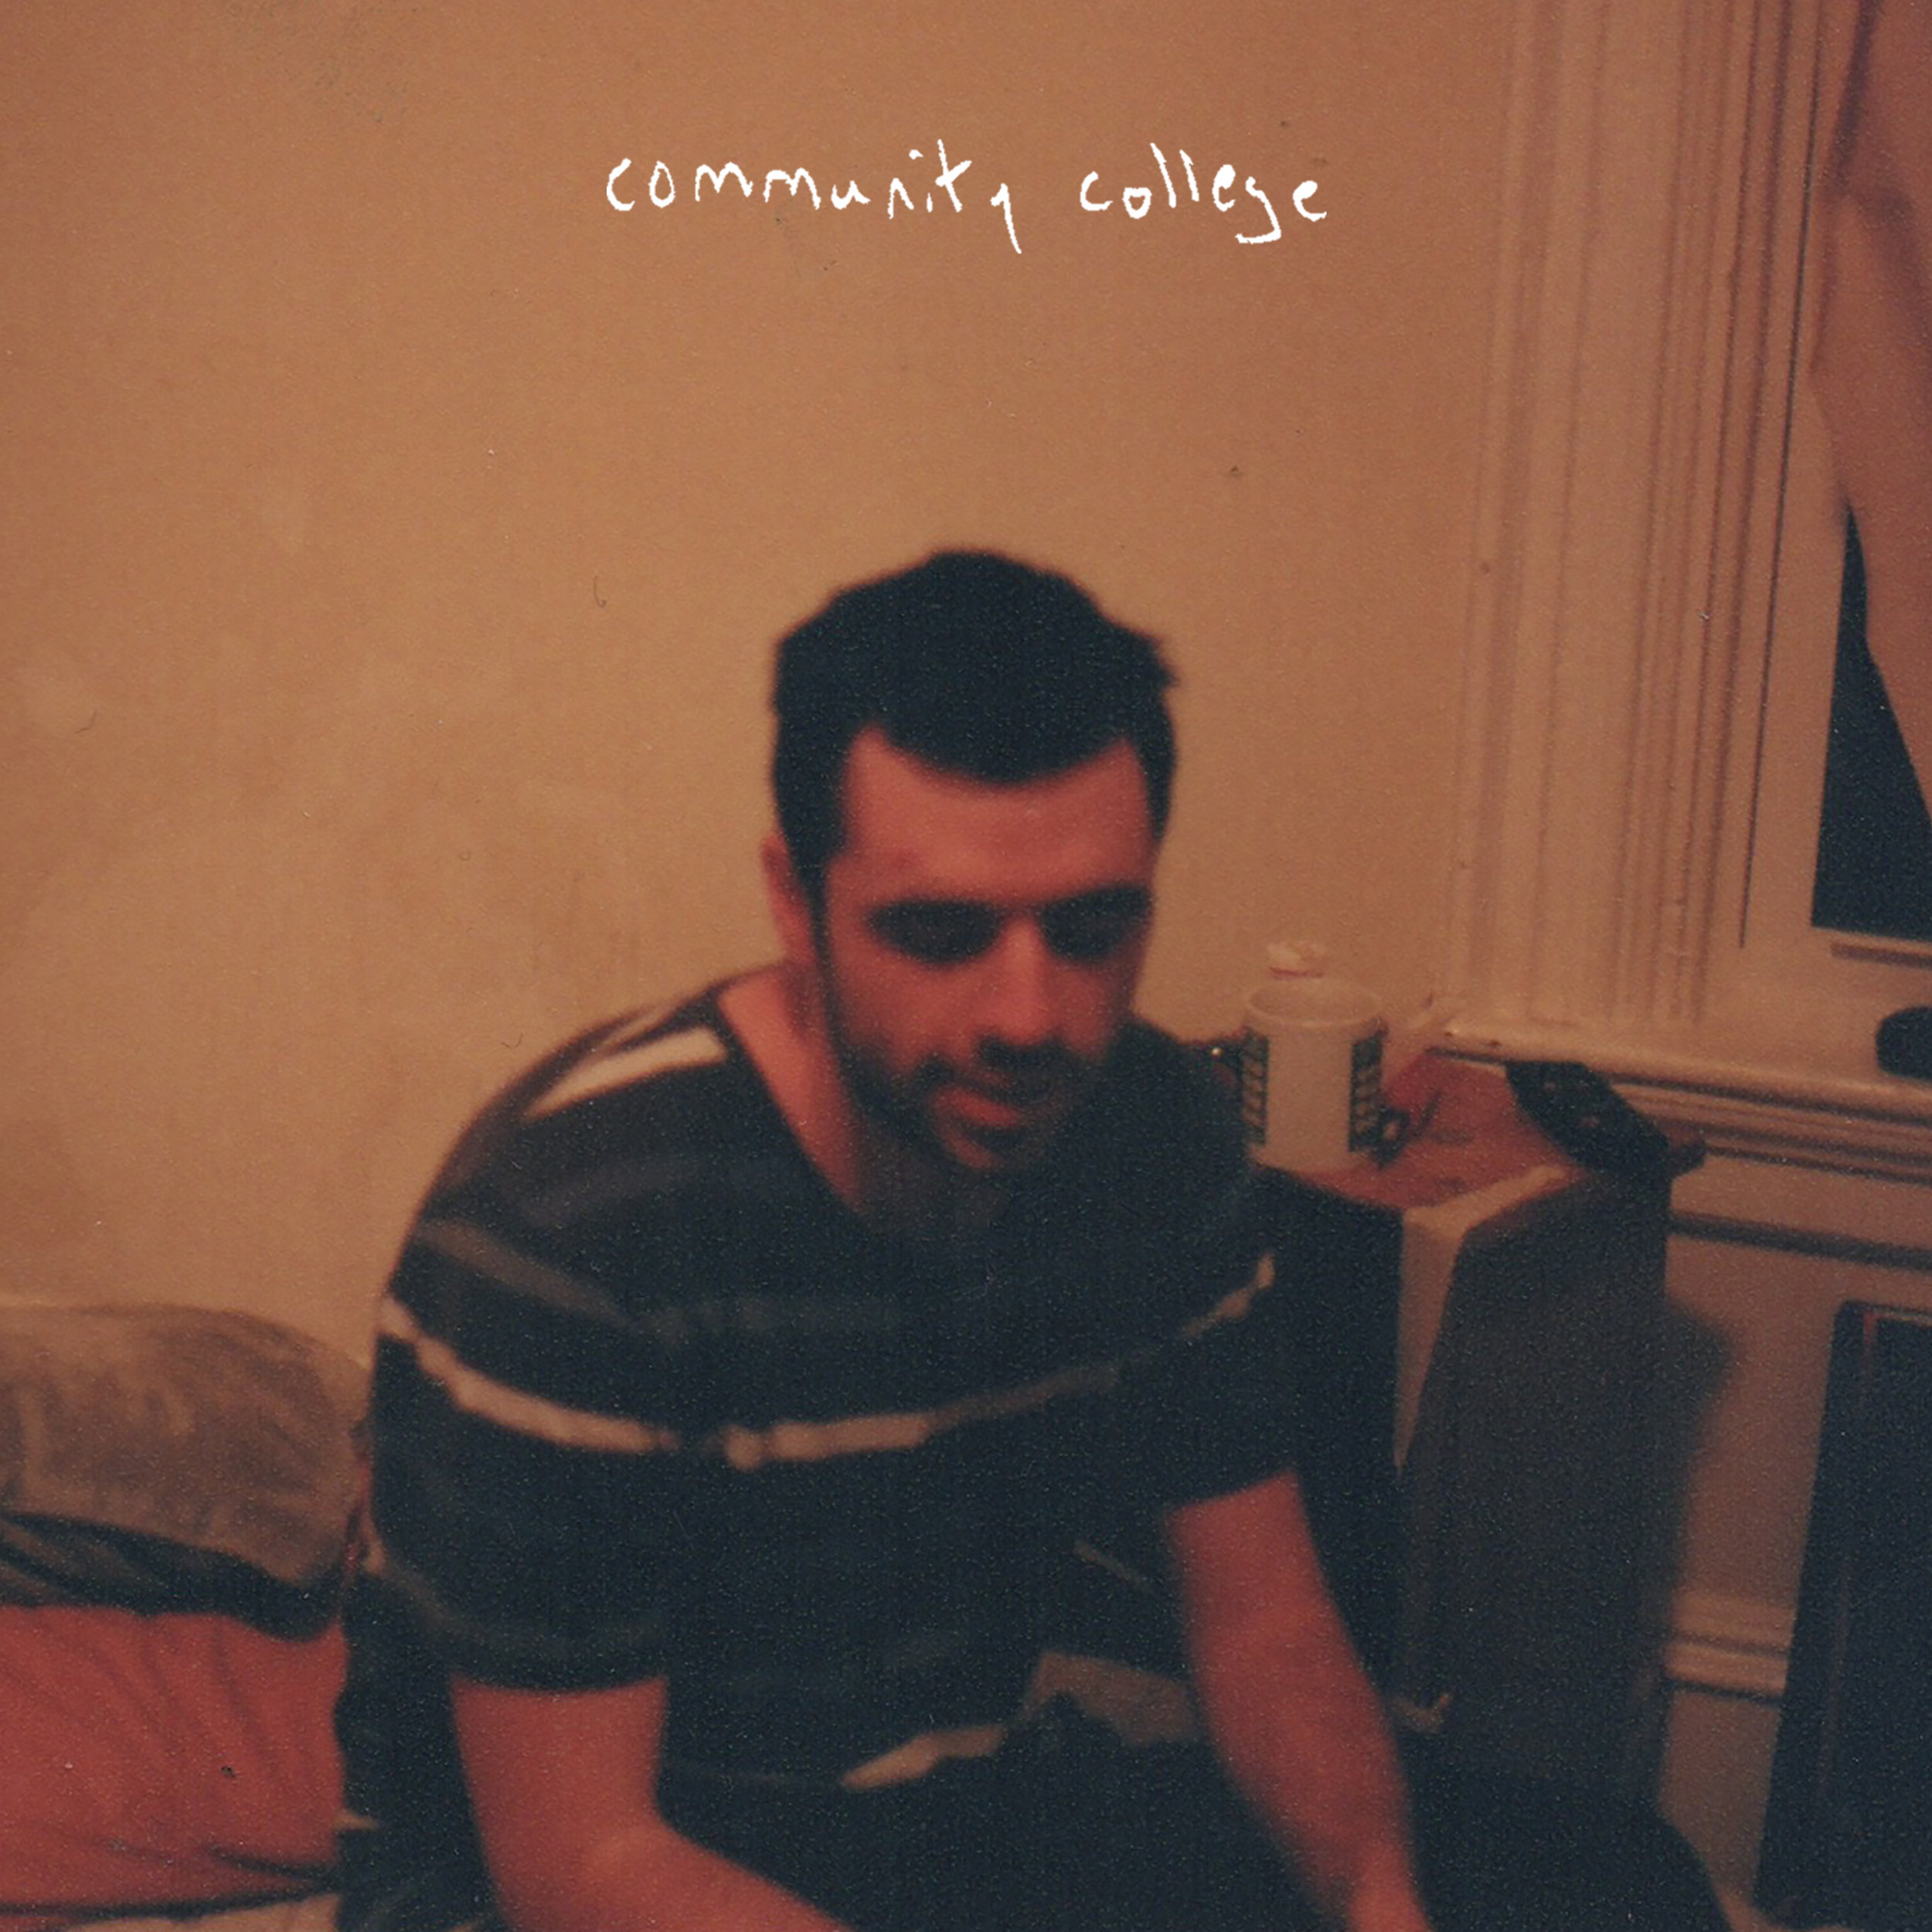 comco-communitycollege-coverart-nodust.jpg